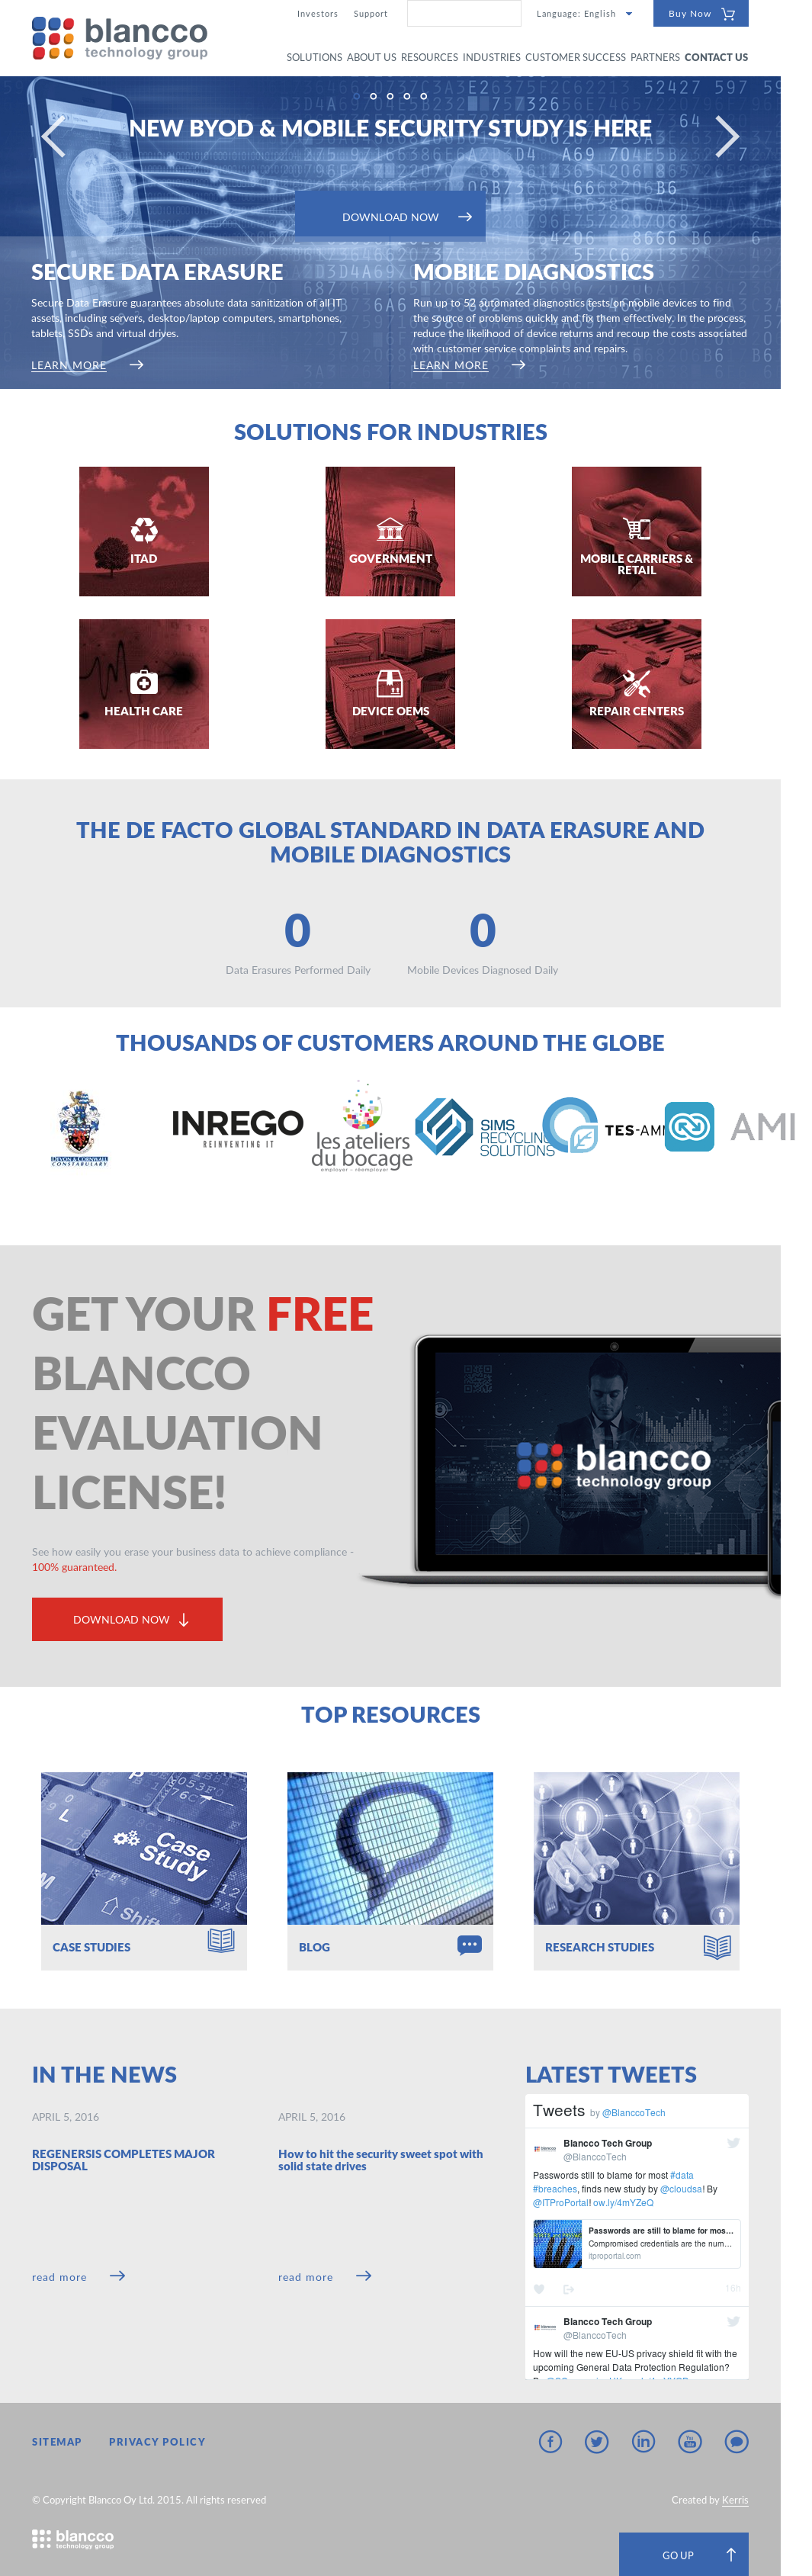 blancco free download